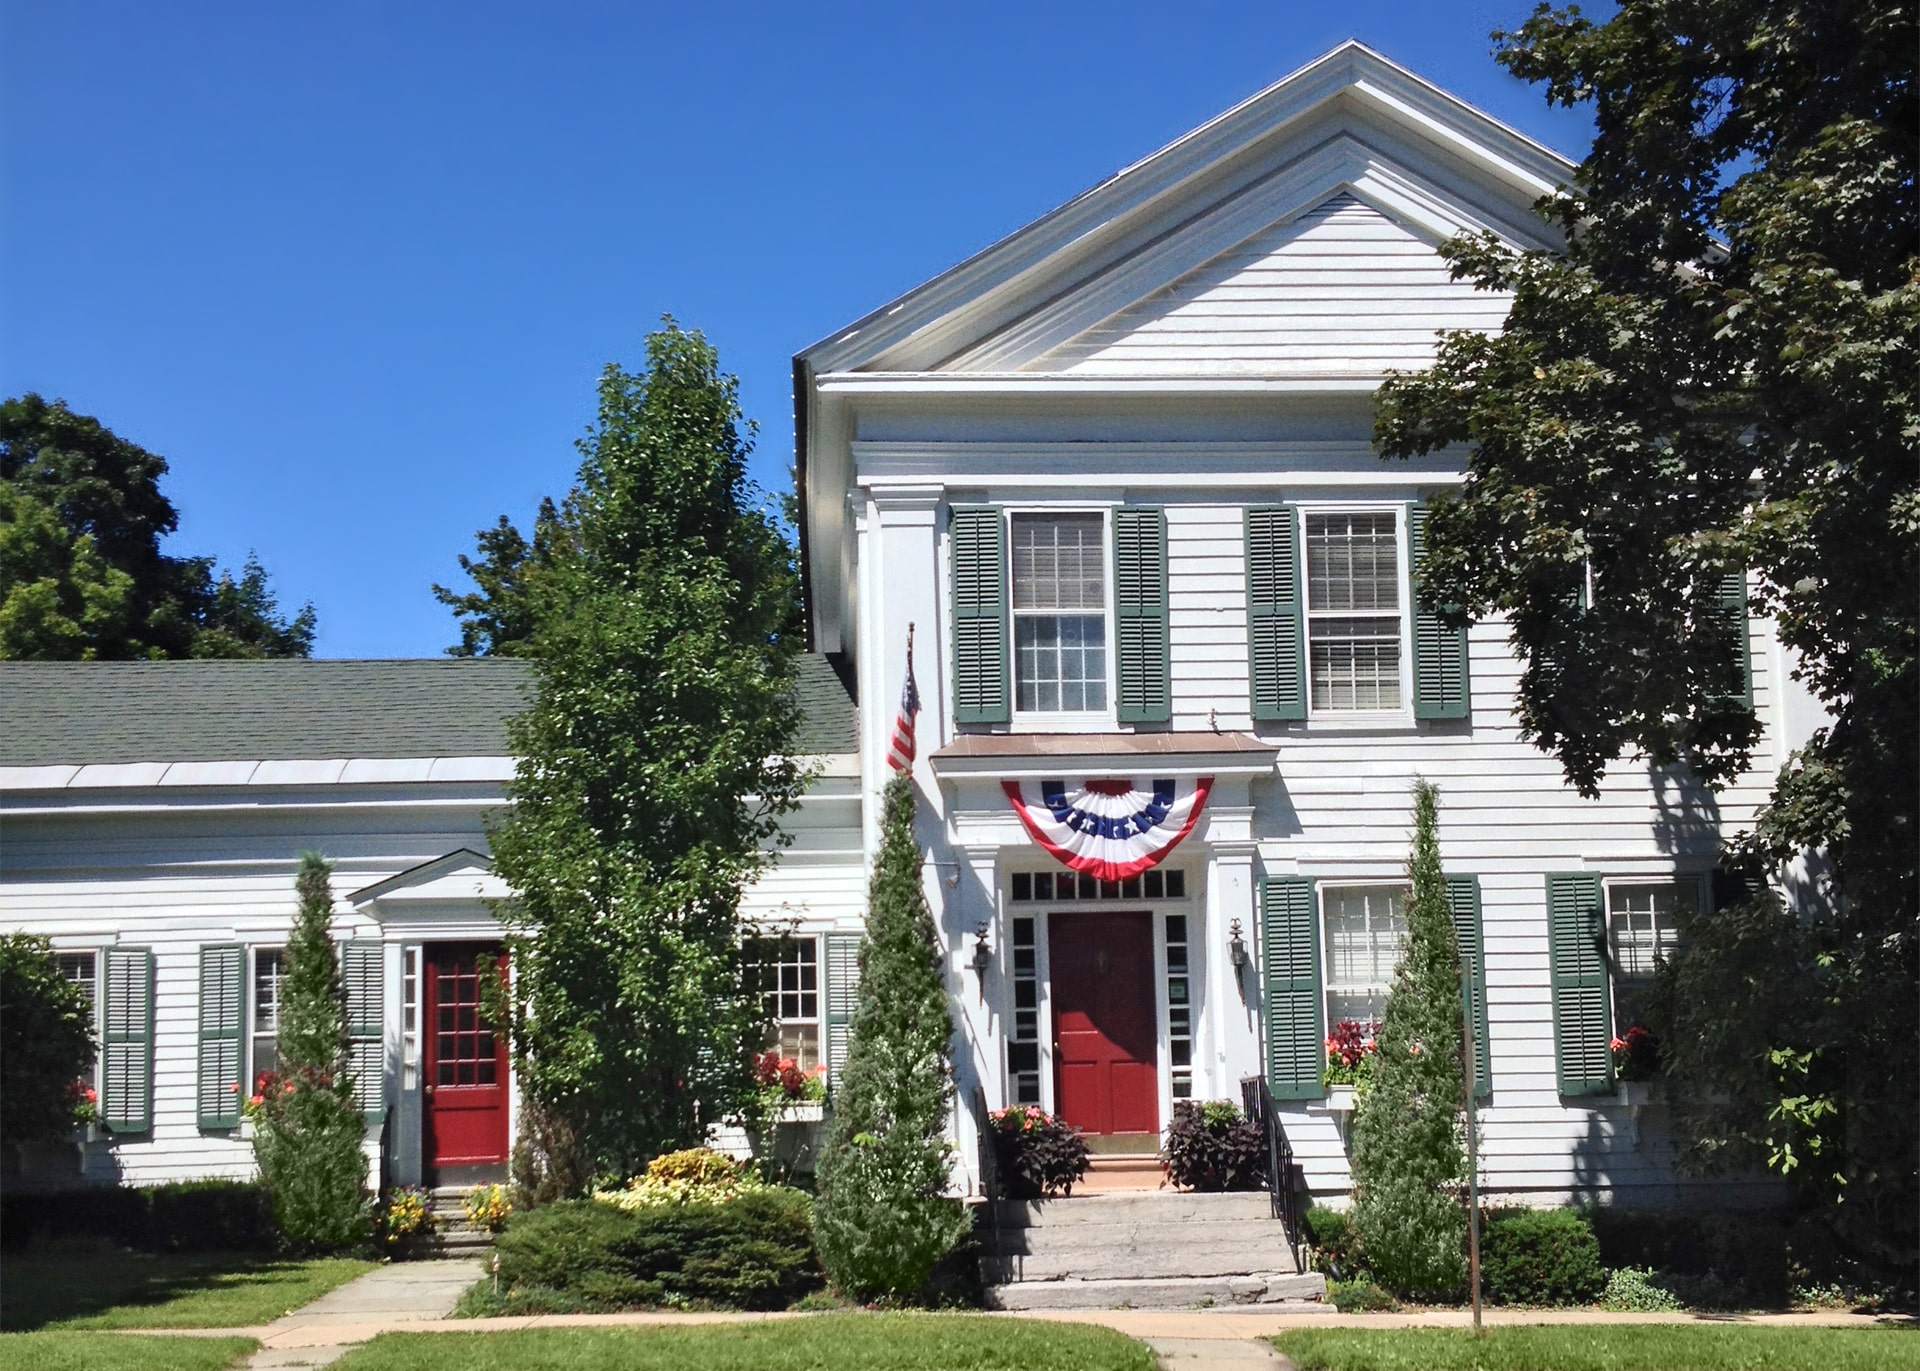 White House Inn in Cooperstown, New York